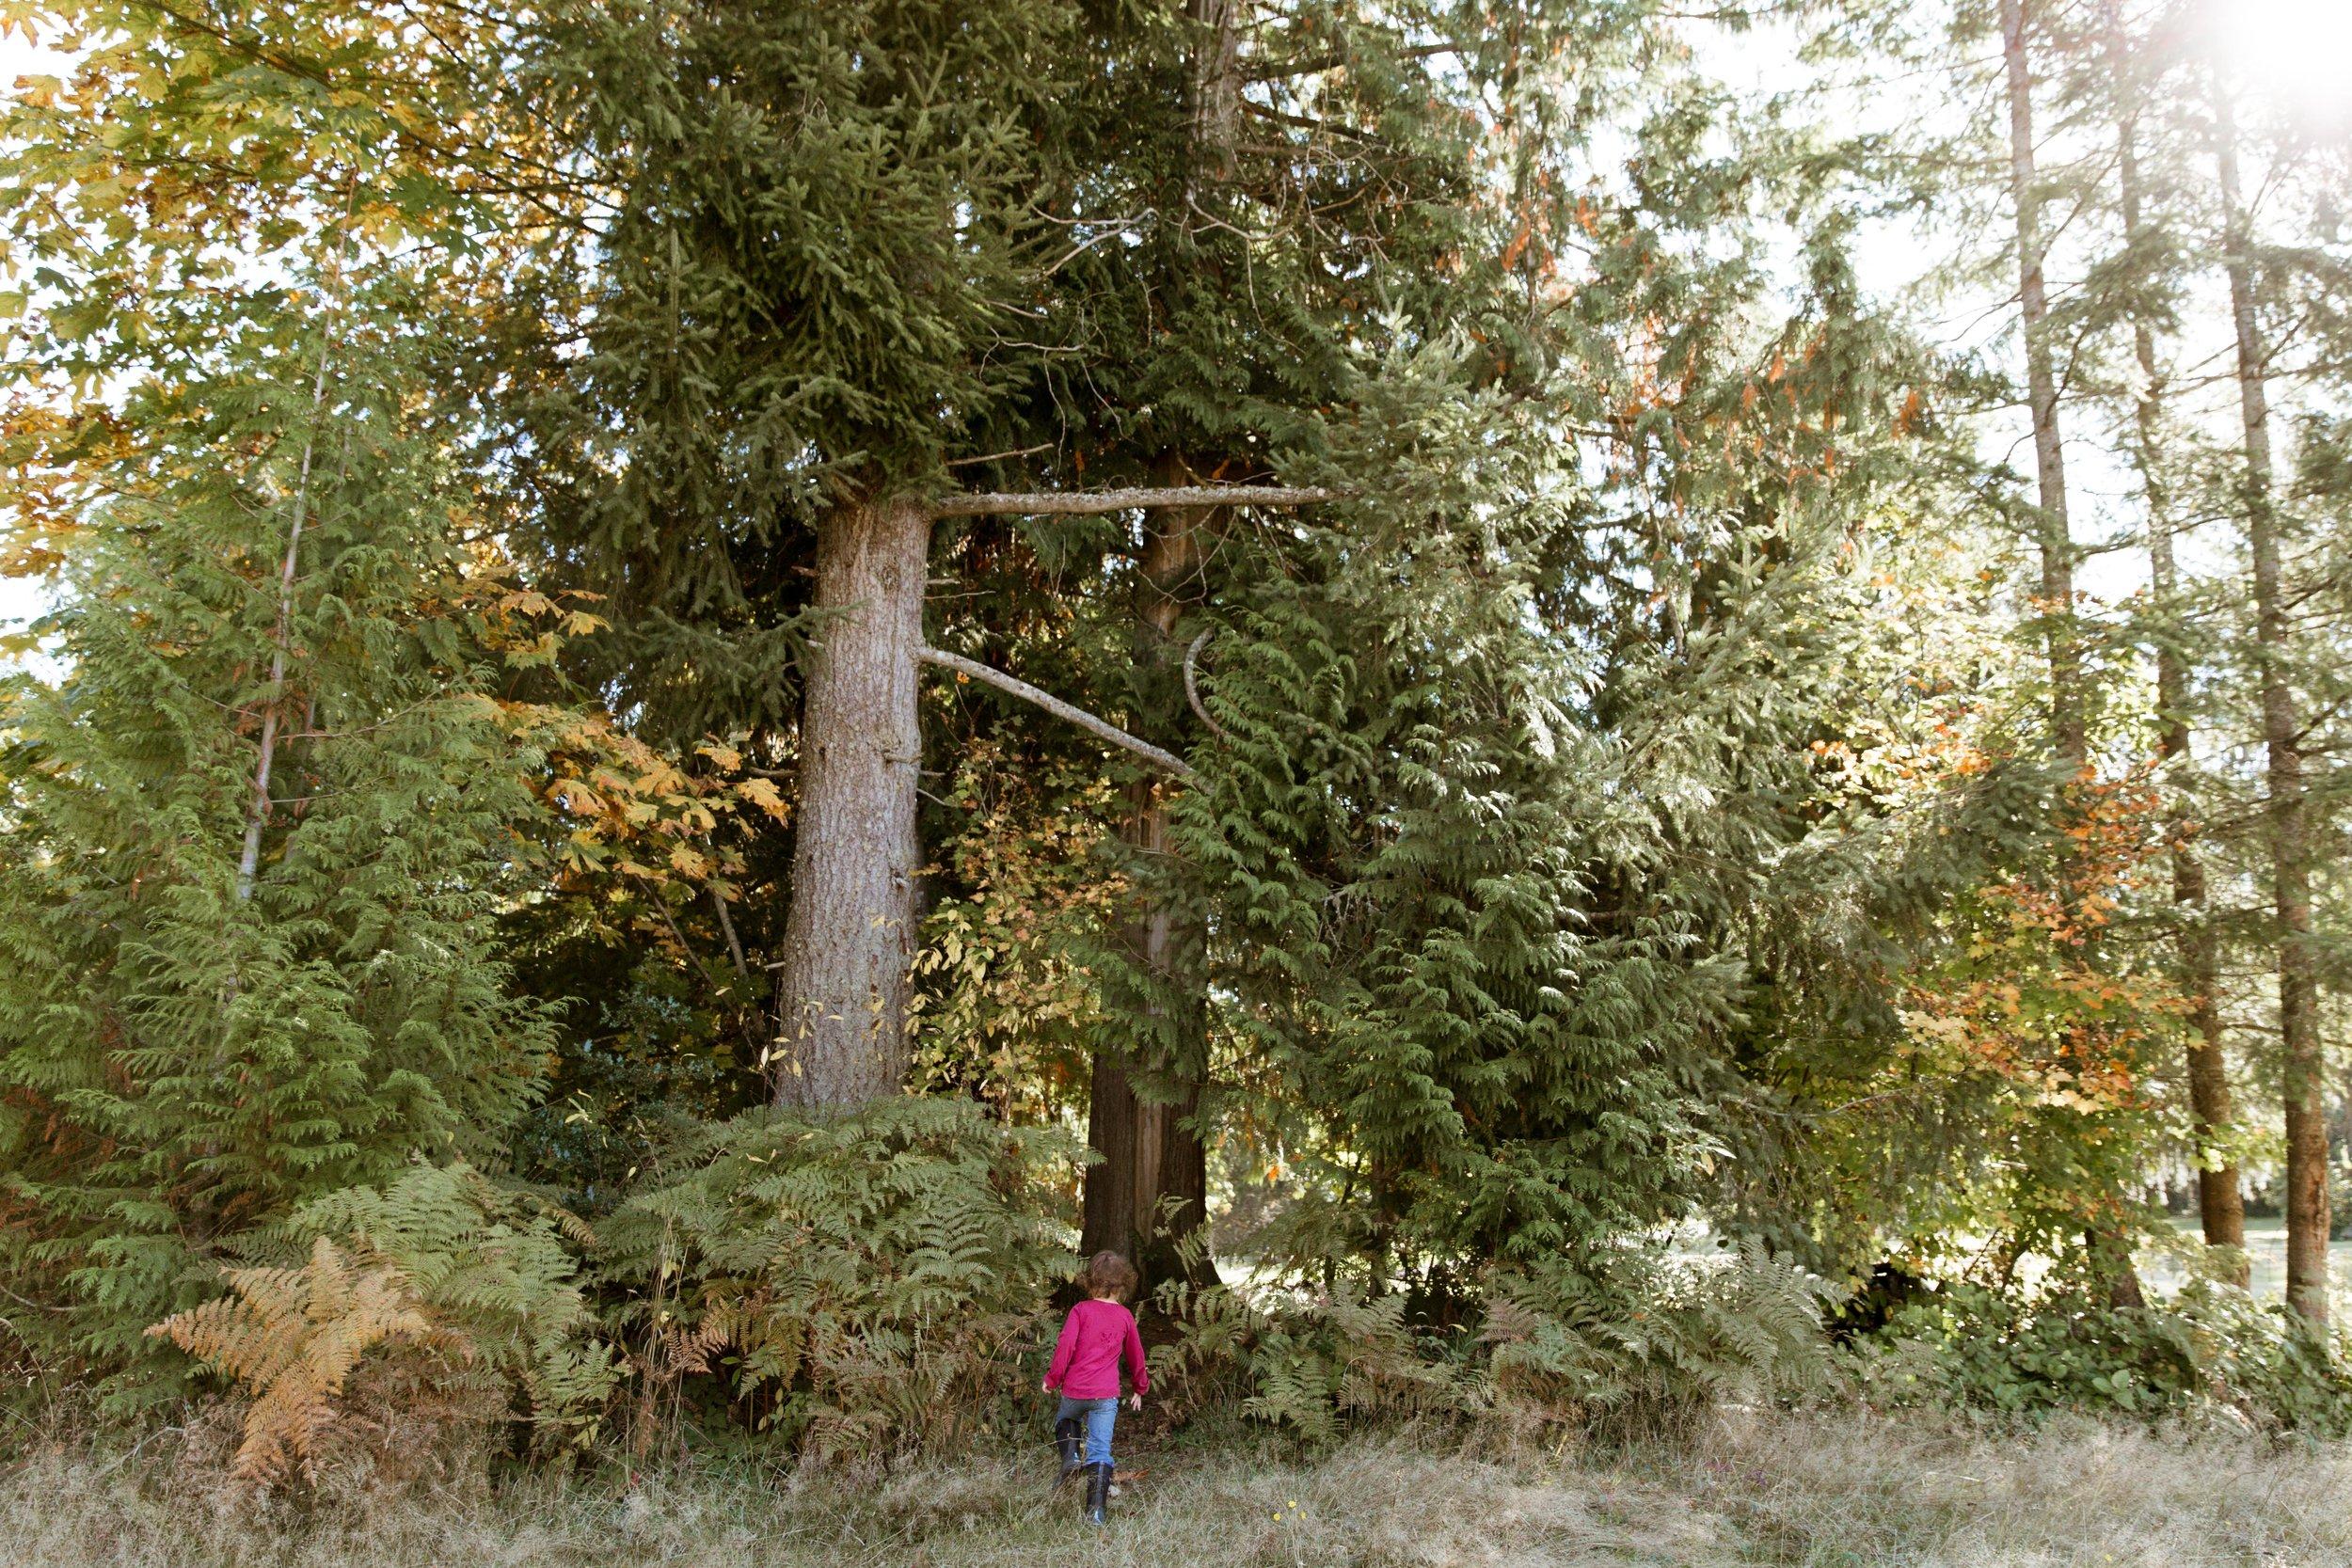 Sienna-Renee-Photography-Nature-Nuts-2879.jpg